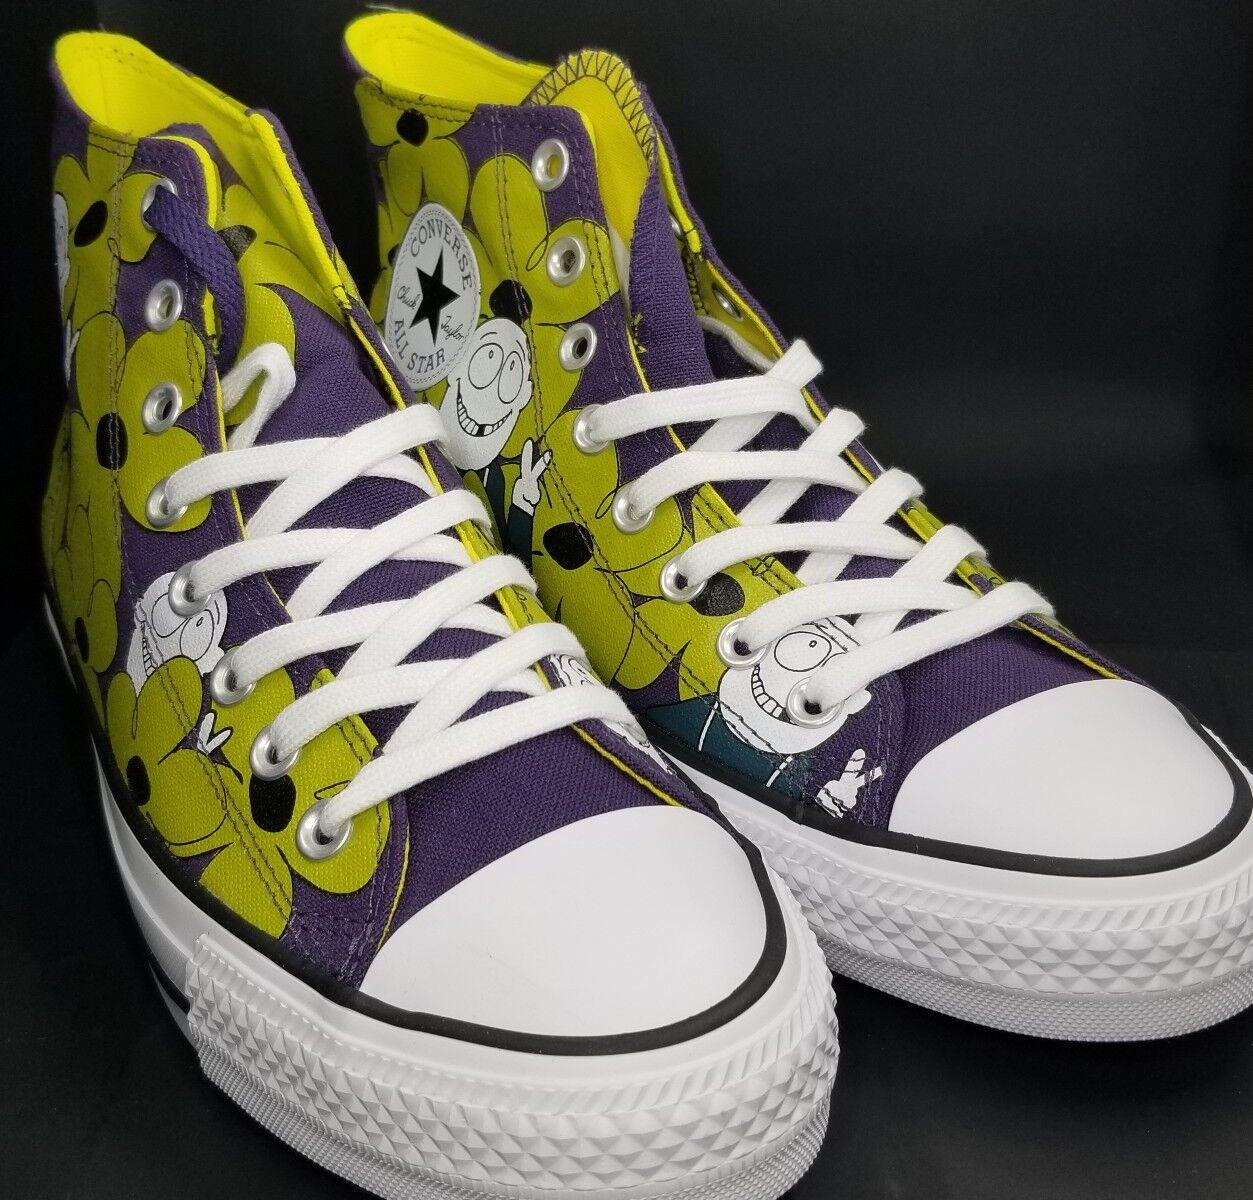 Scarpe casual da uomo  Converse x Dinosaur, Jr Chuck Taylor All Star Pro Sneaker Size 7.5 158663C